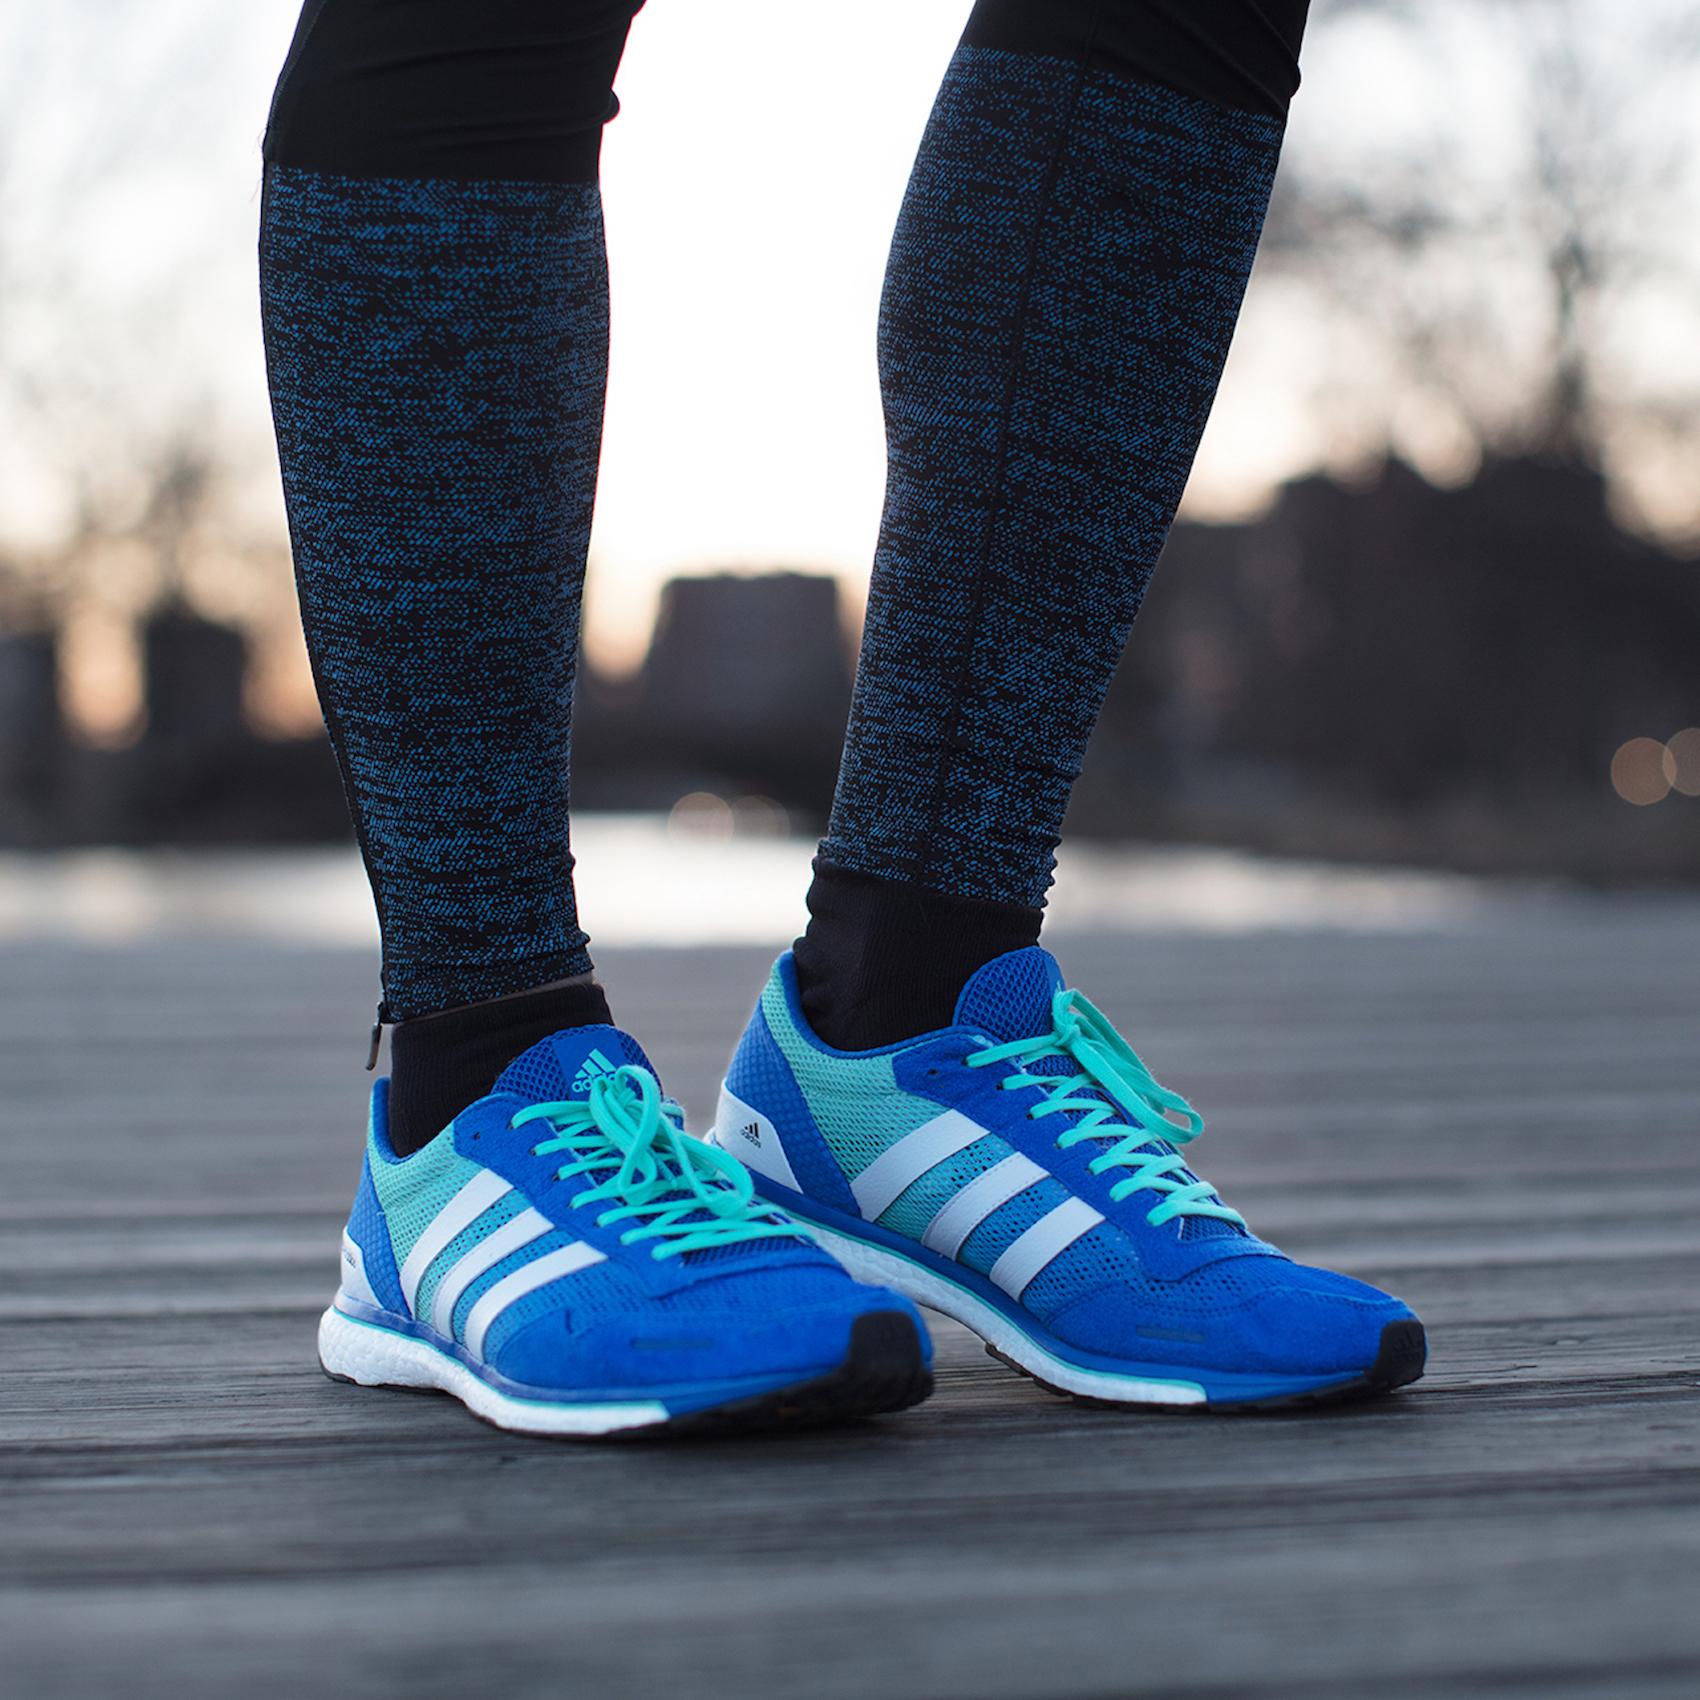 adidas Kathrine Switzer 261 Fearless 2017 Boston Marathon 1